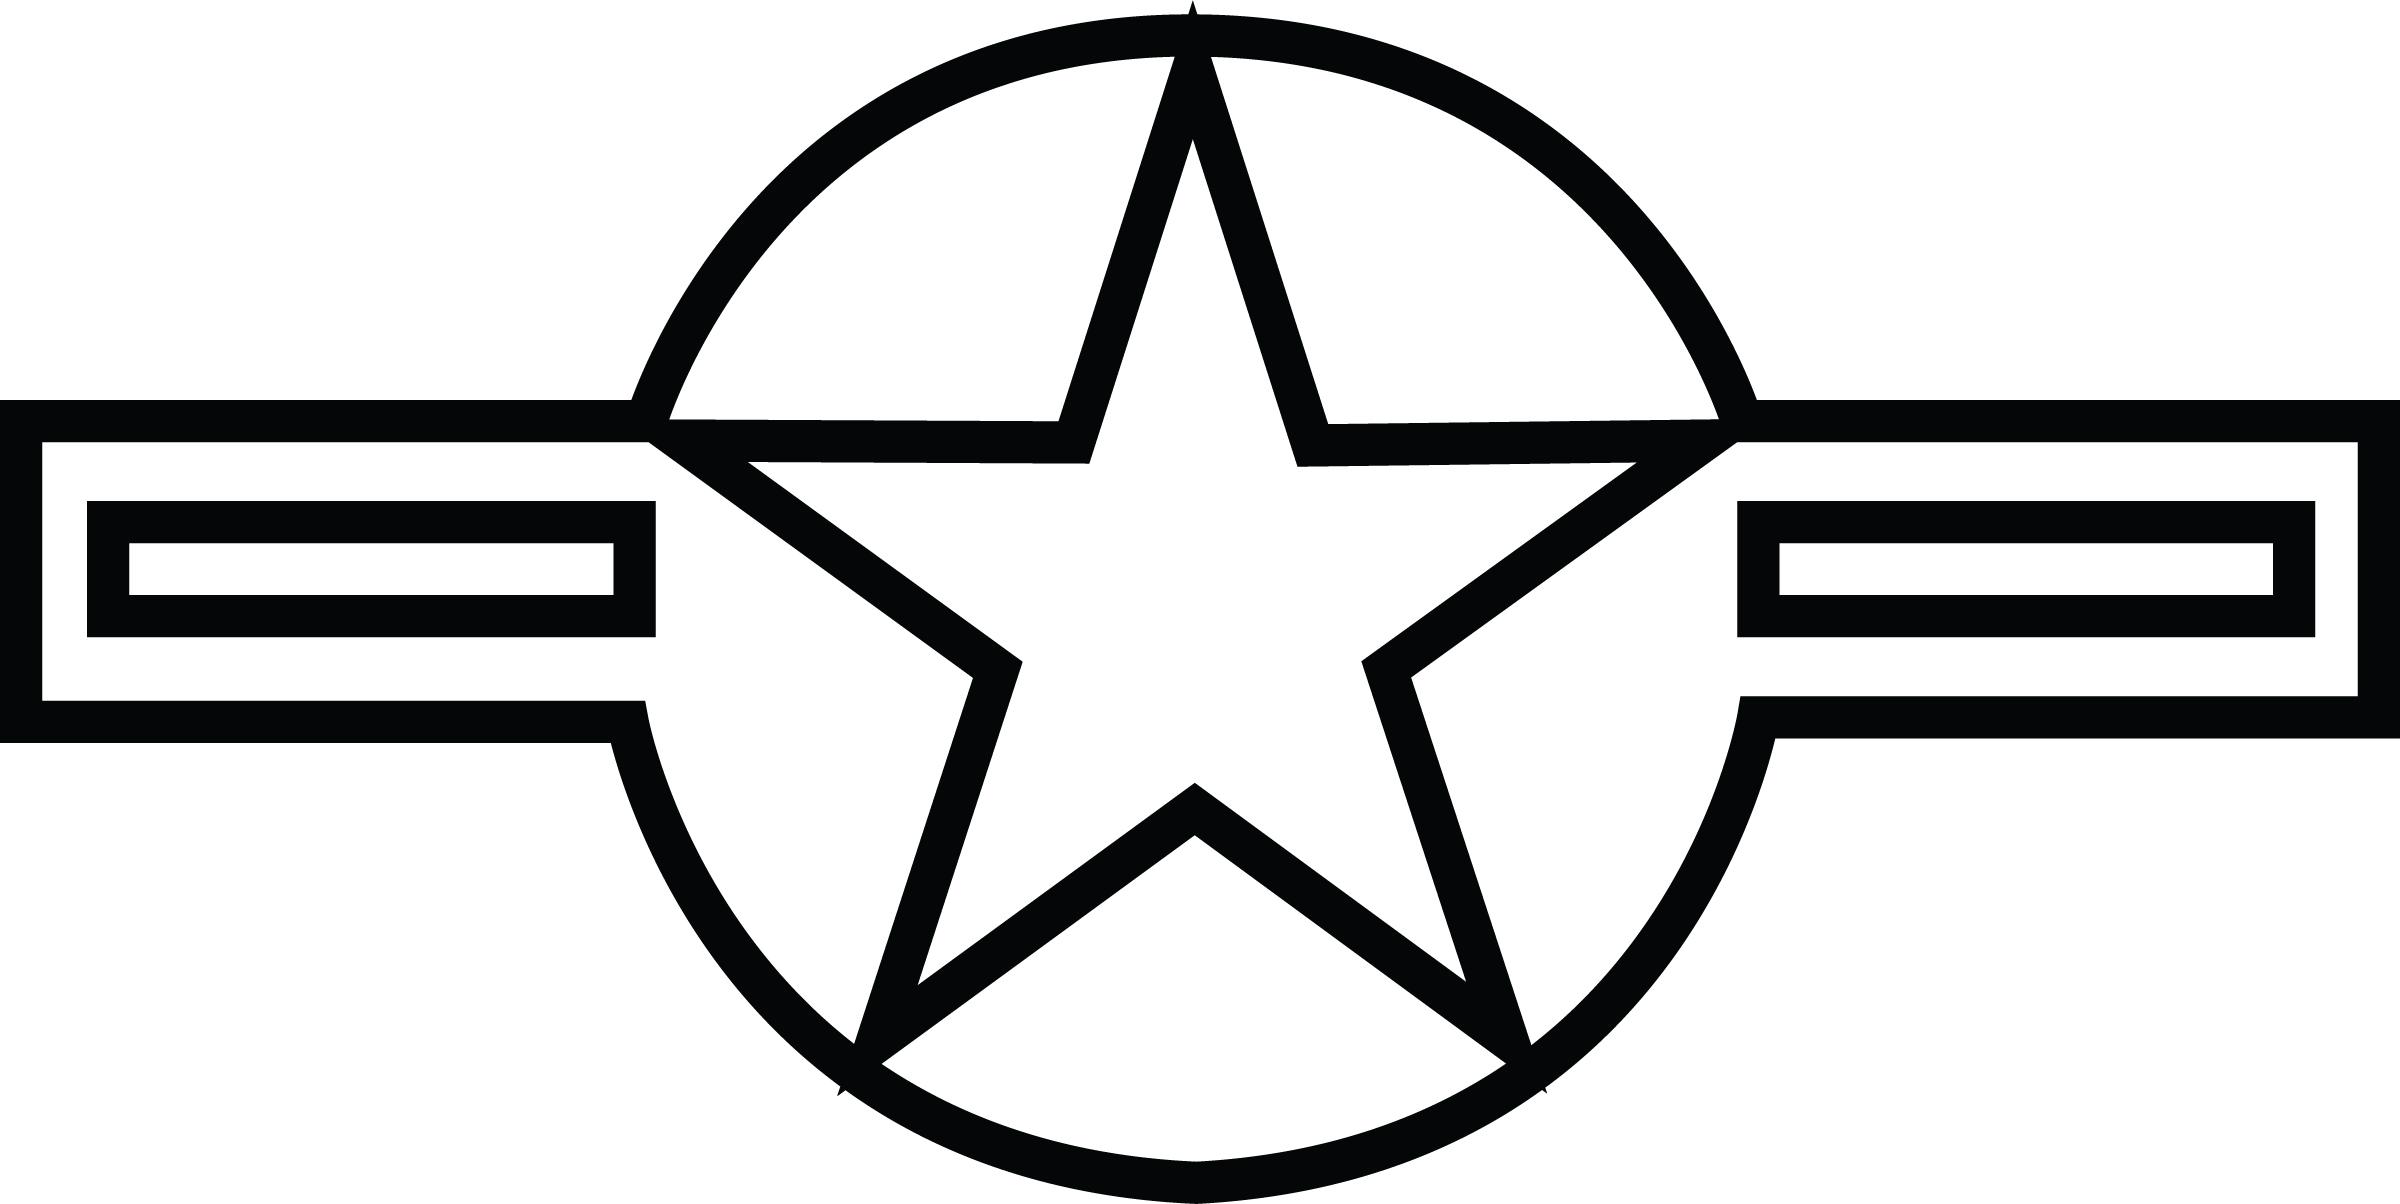 Air Force Logo Vector At Getdrawings